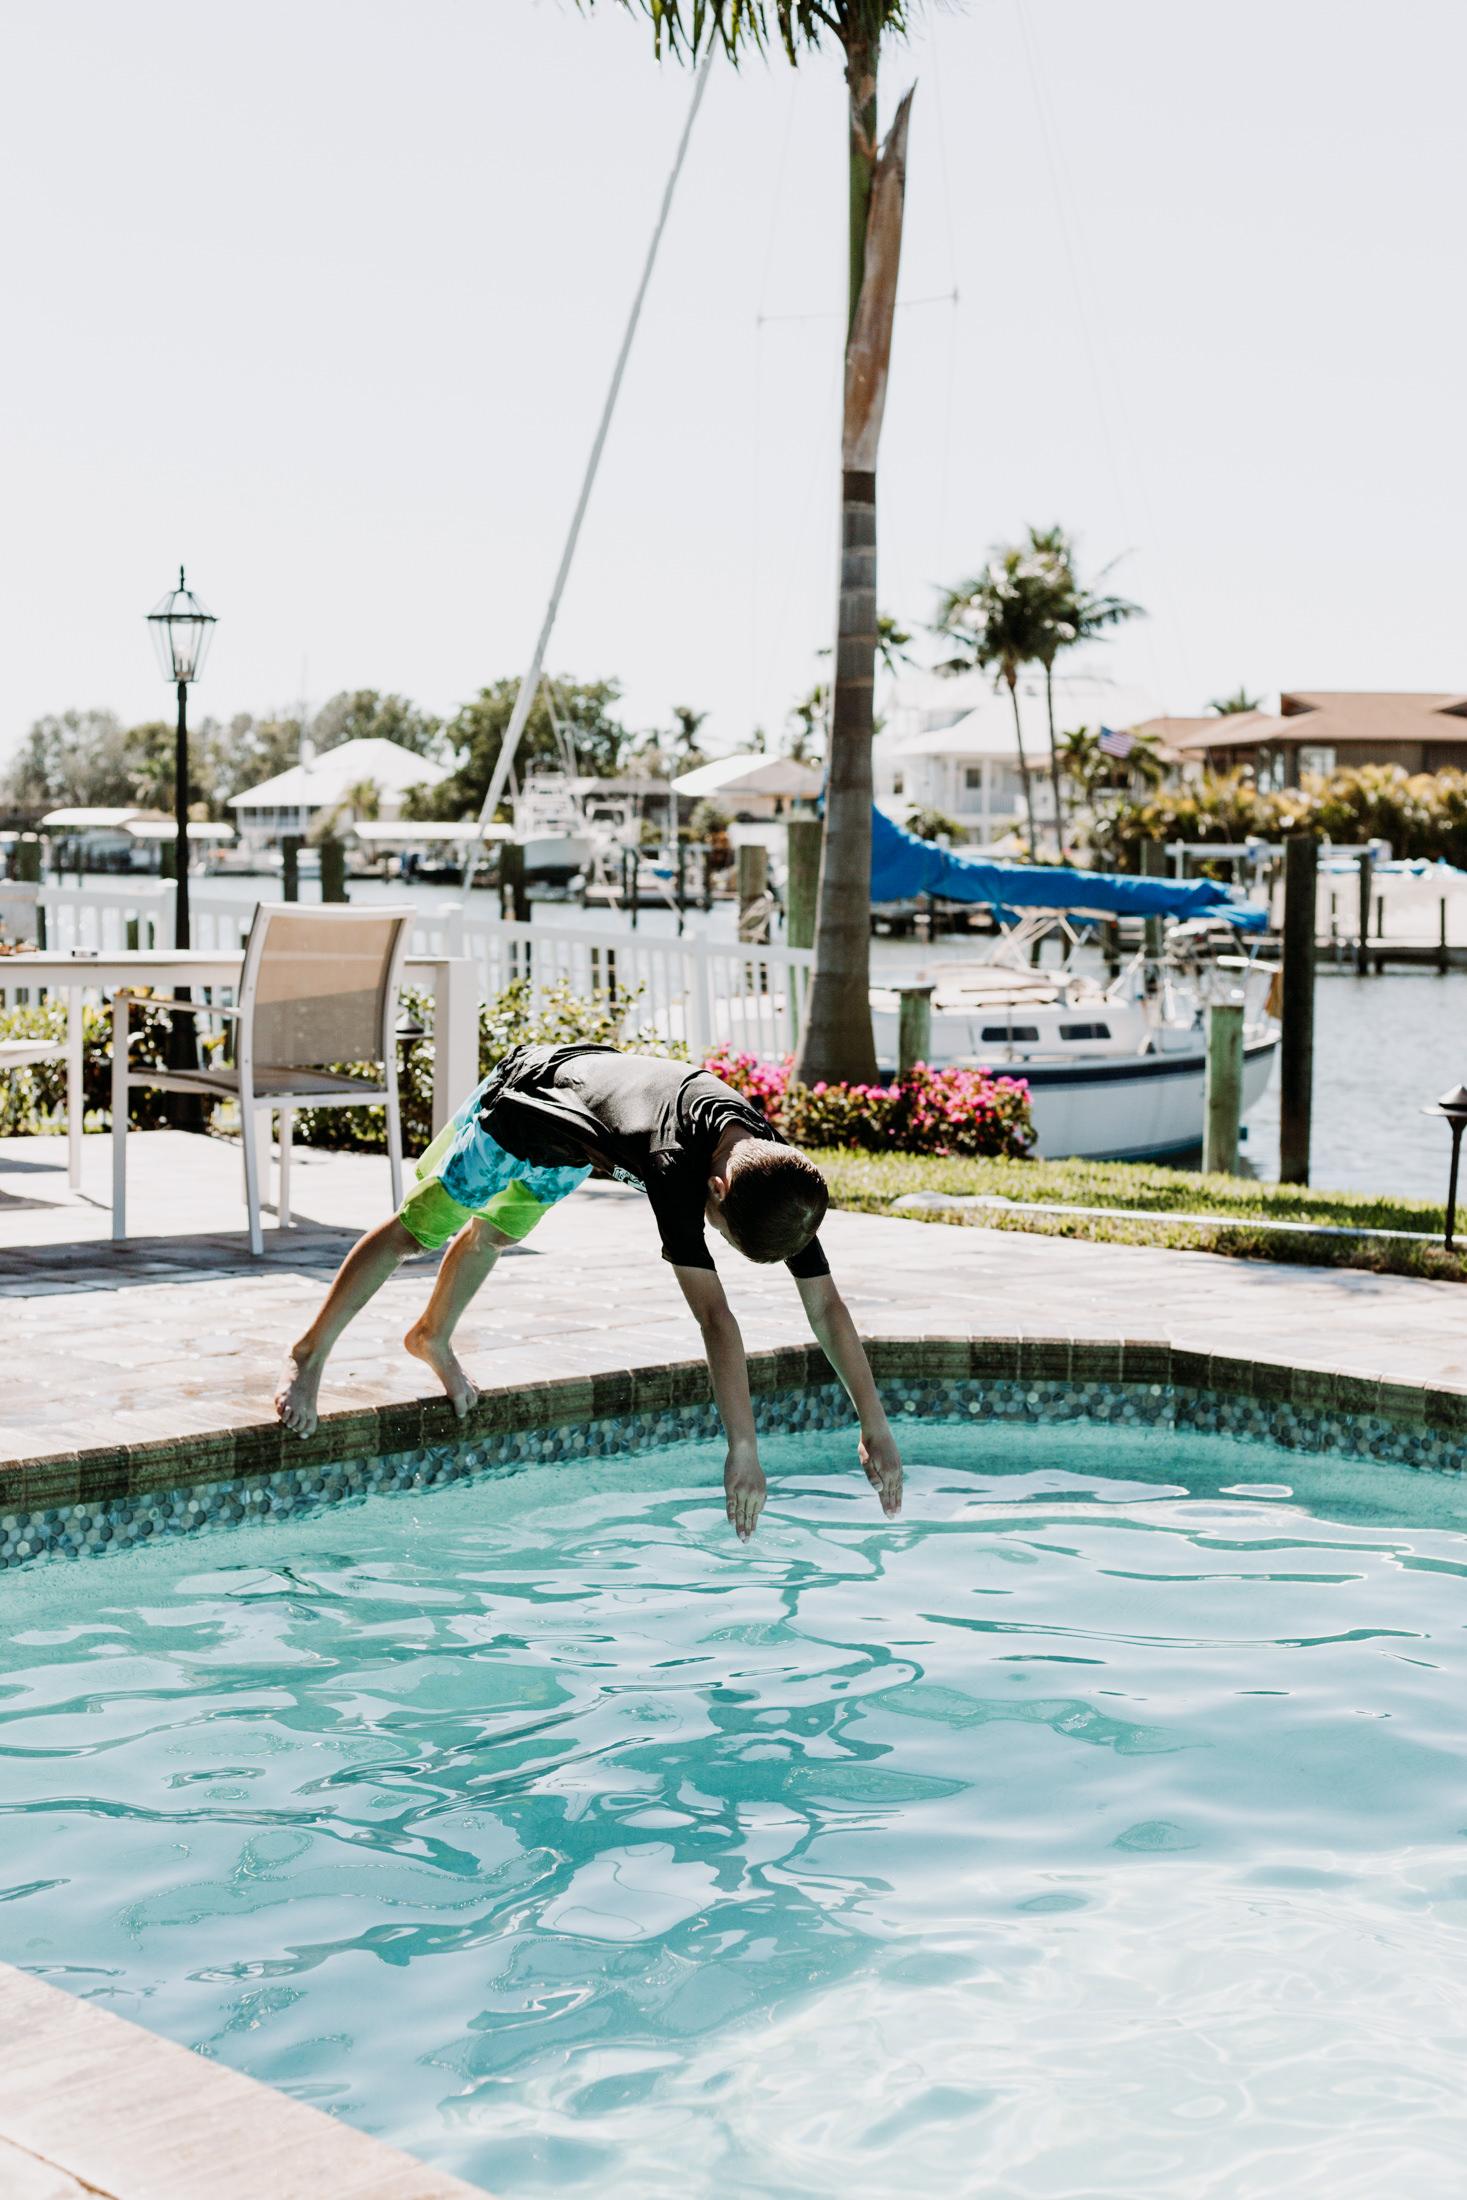 Florida Trip 2018-24.JPG